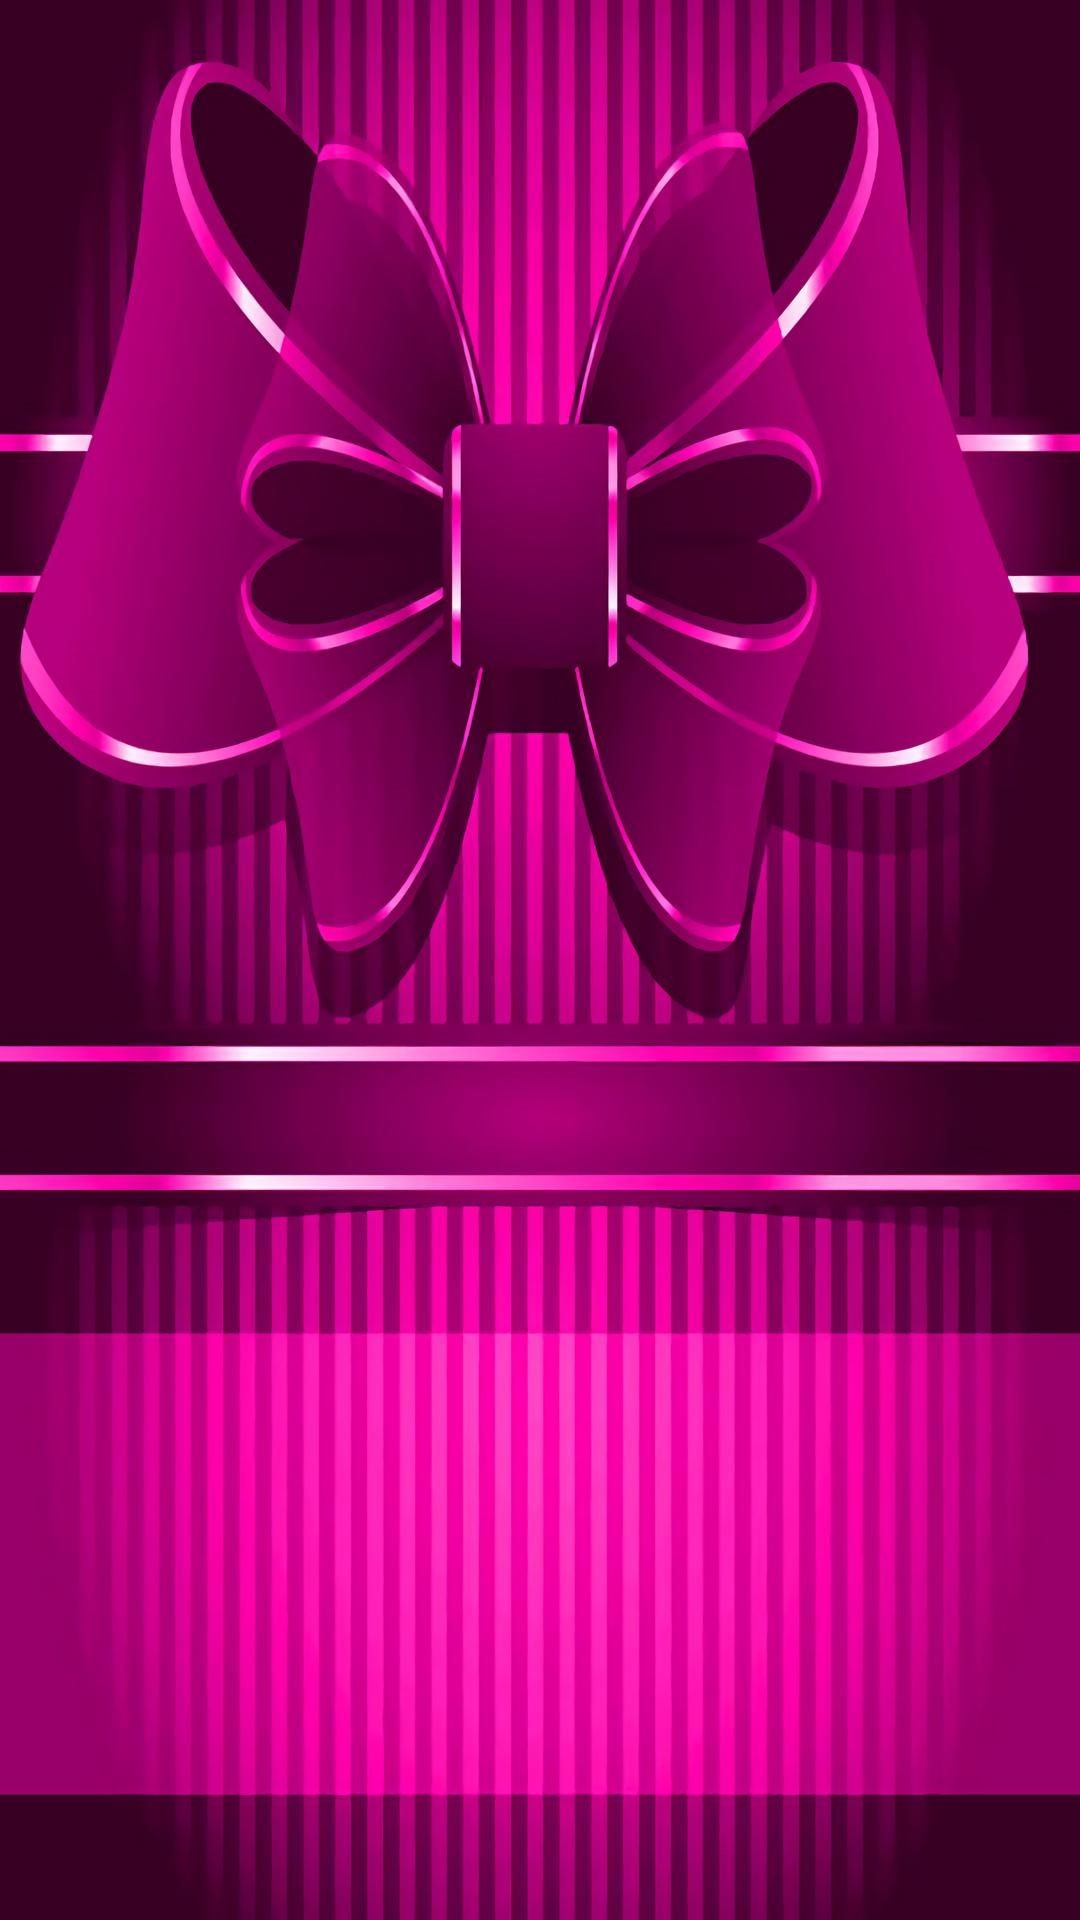 1080x1920, Bow Wallpaper, Wallpaper Backgrounds, Iphone - Iphone Wallpaper Bow Pink - HD Wallpaper